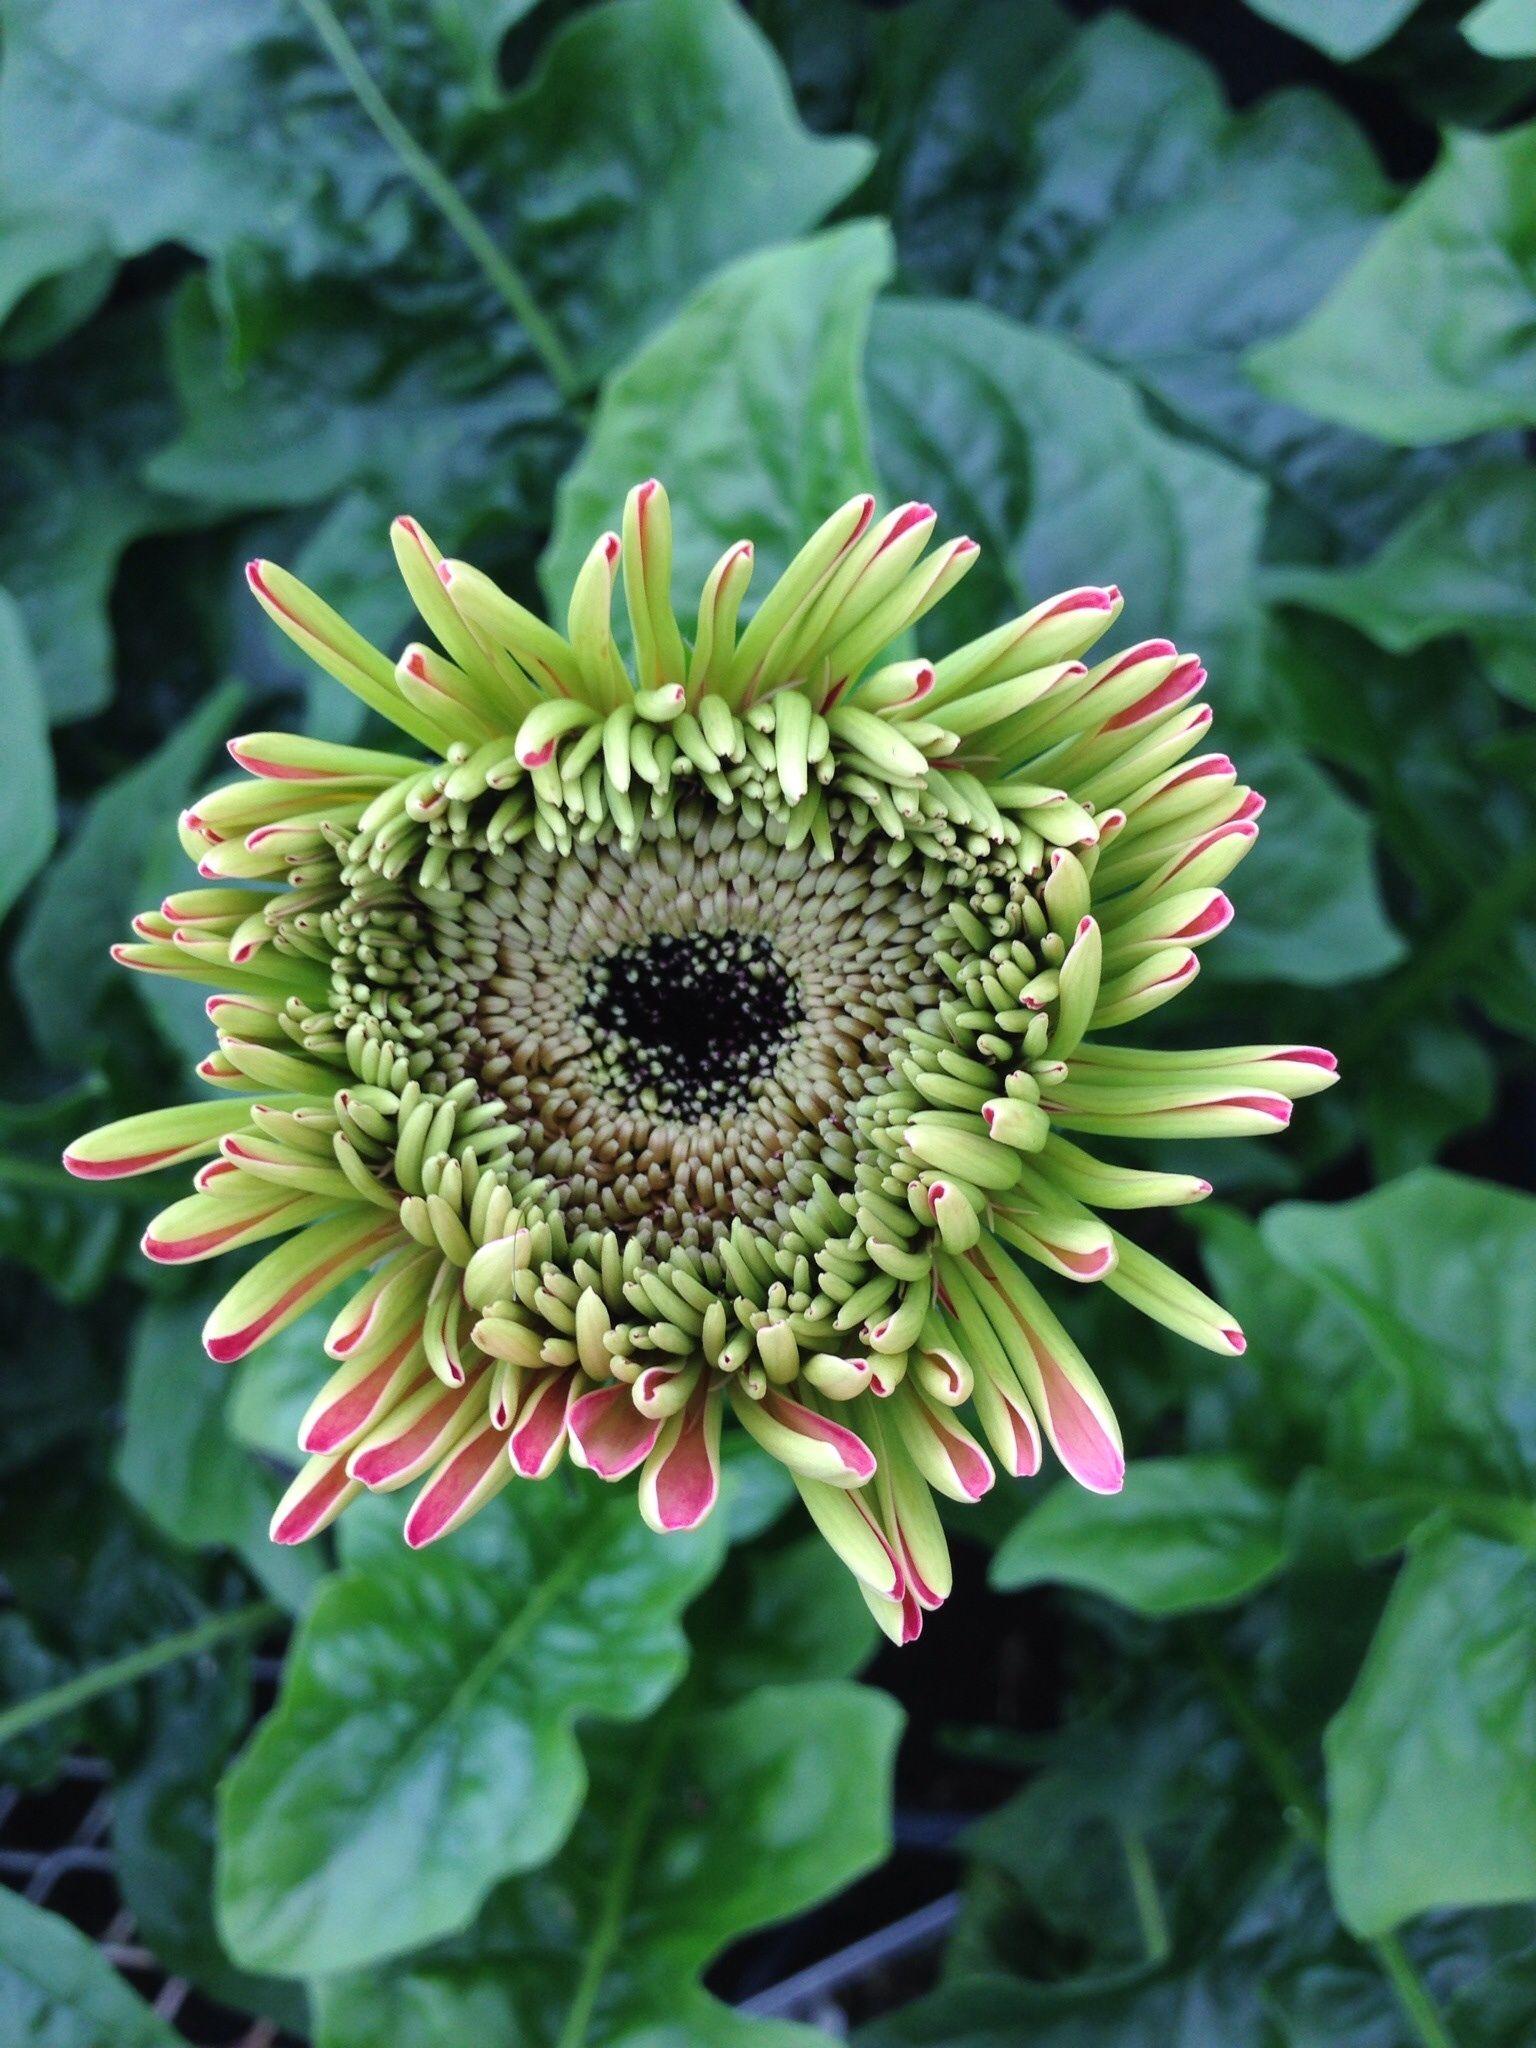 Pin By Klepac Greenhouses Inc On Gerbera Daisies Gerbera Daisy Daisy Love Daisy